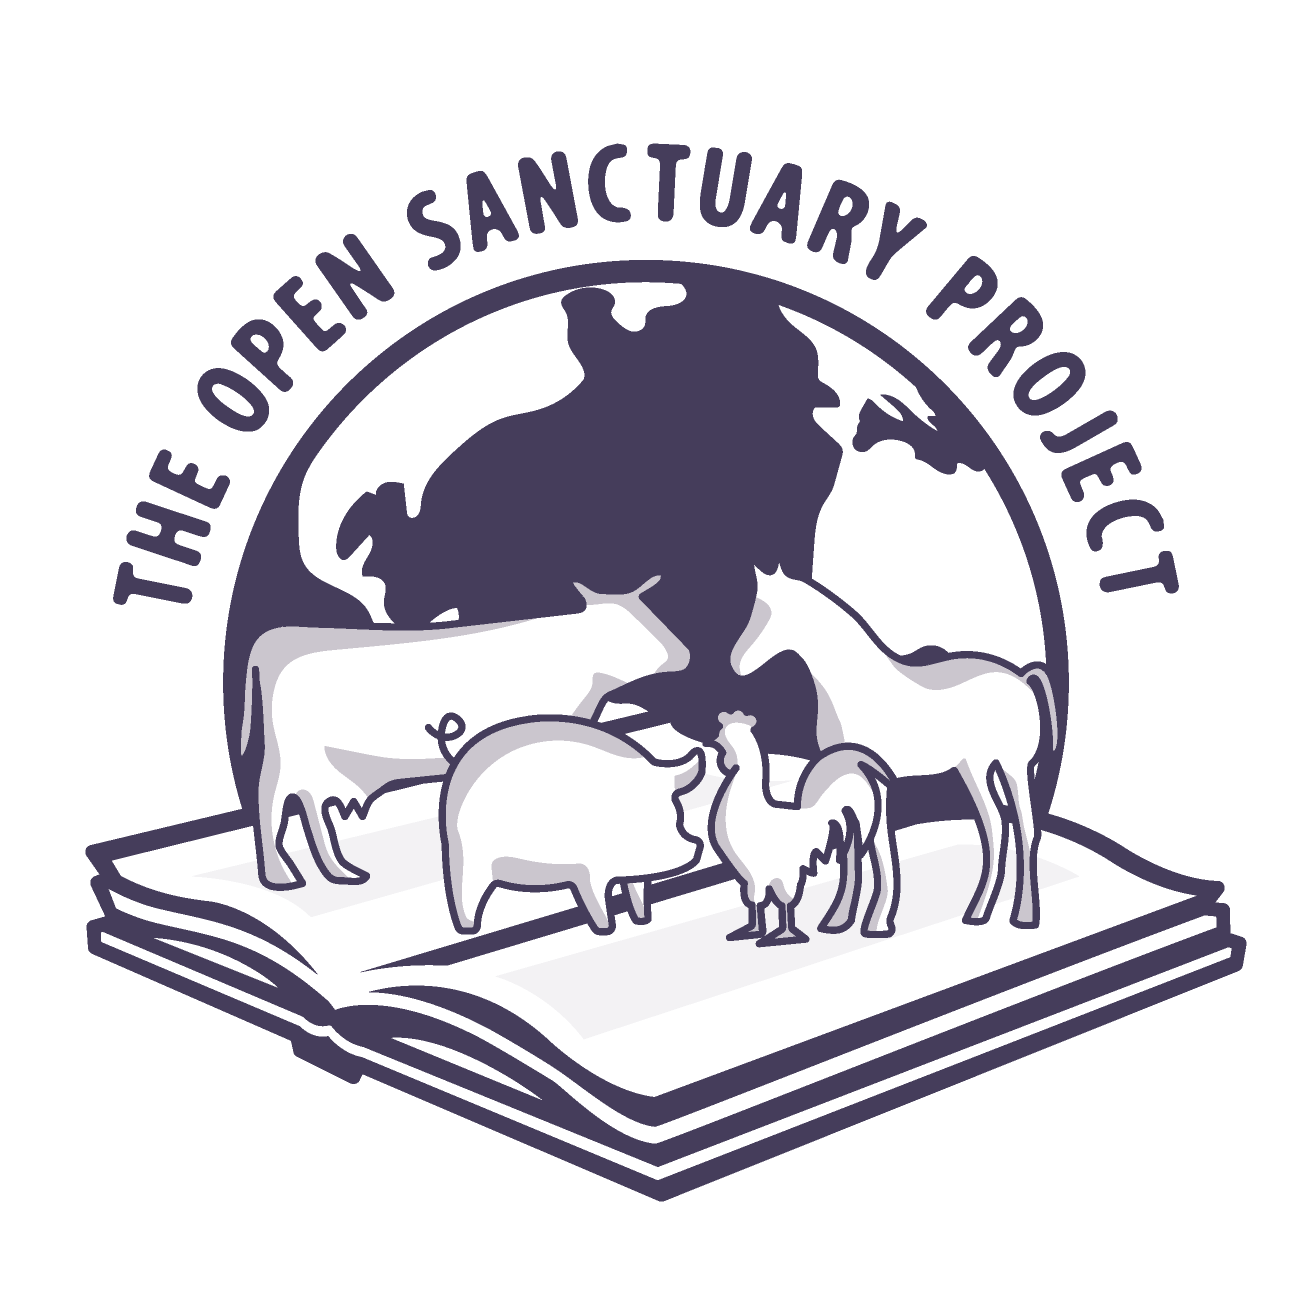 The Open Sanctuary Project